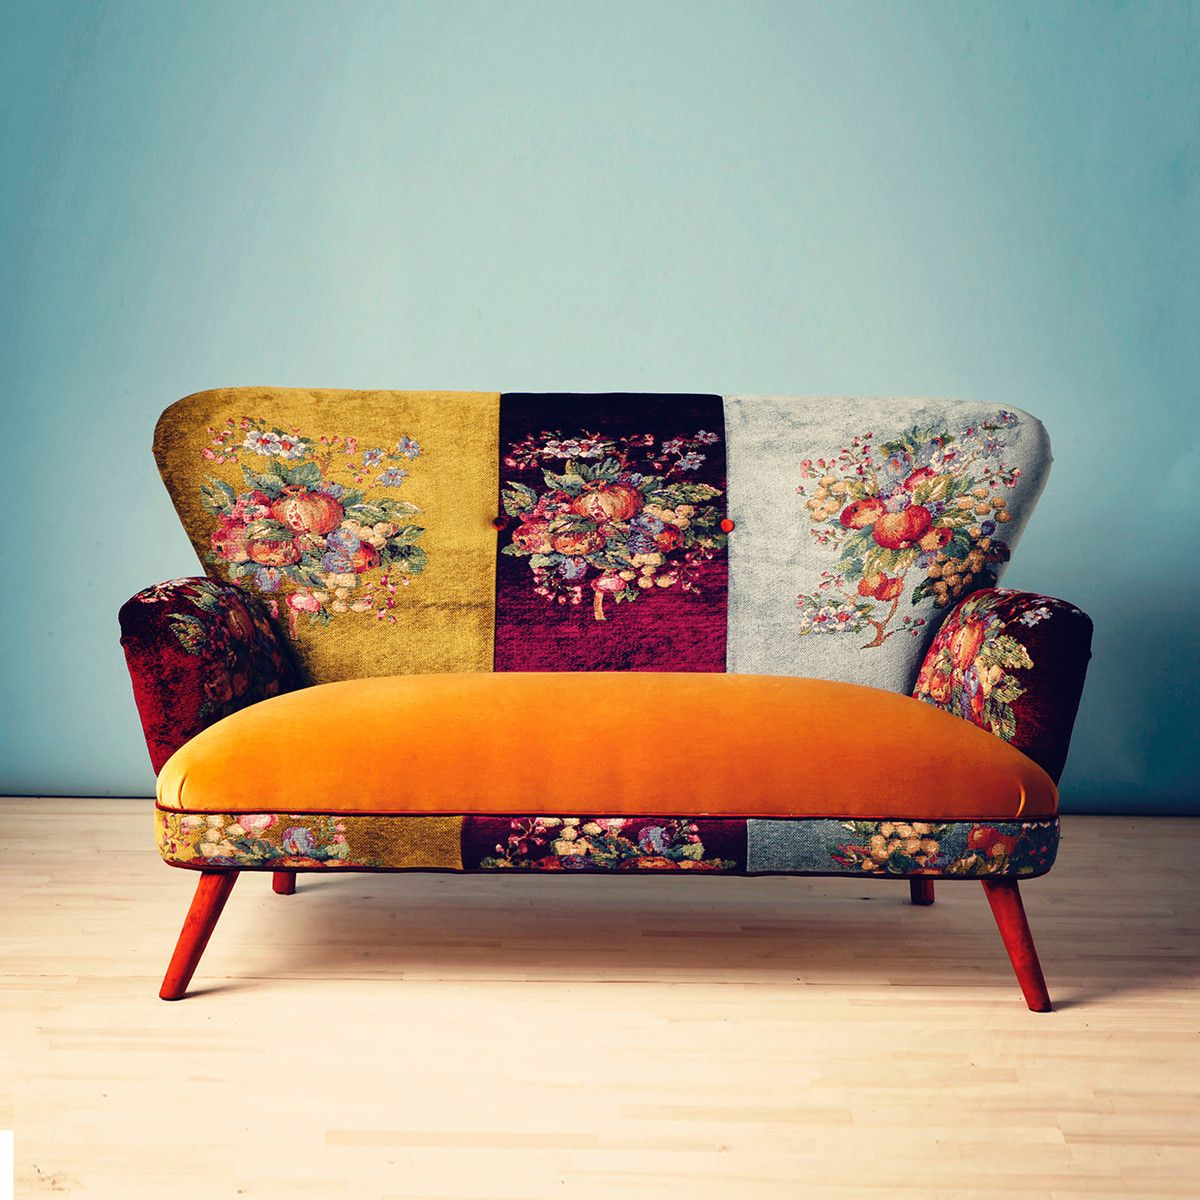 sofa for van singapore grey linen sleeper eu fab gobelin senfgelb furniture i like